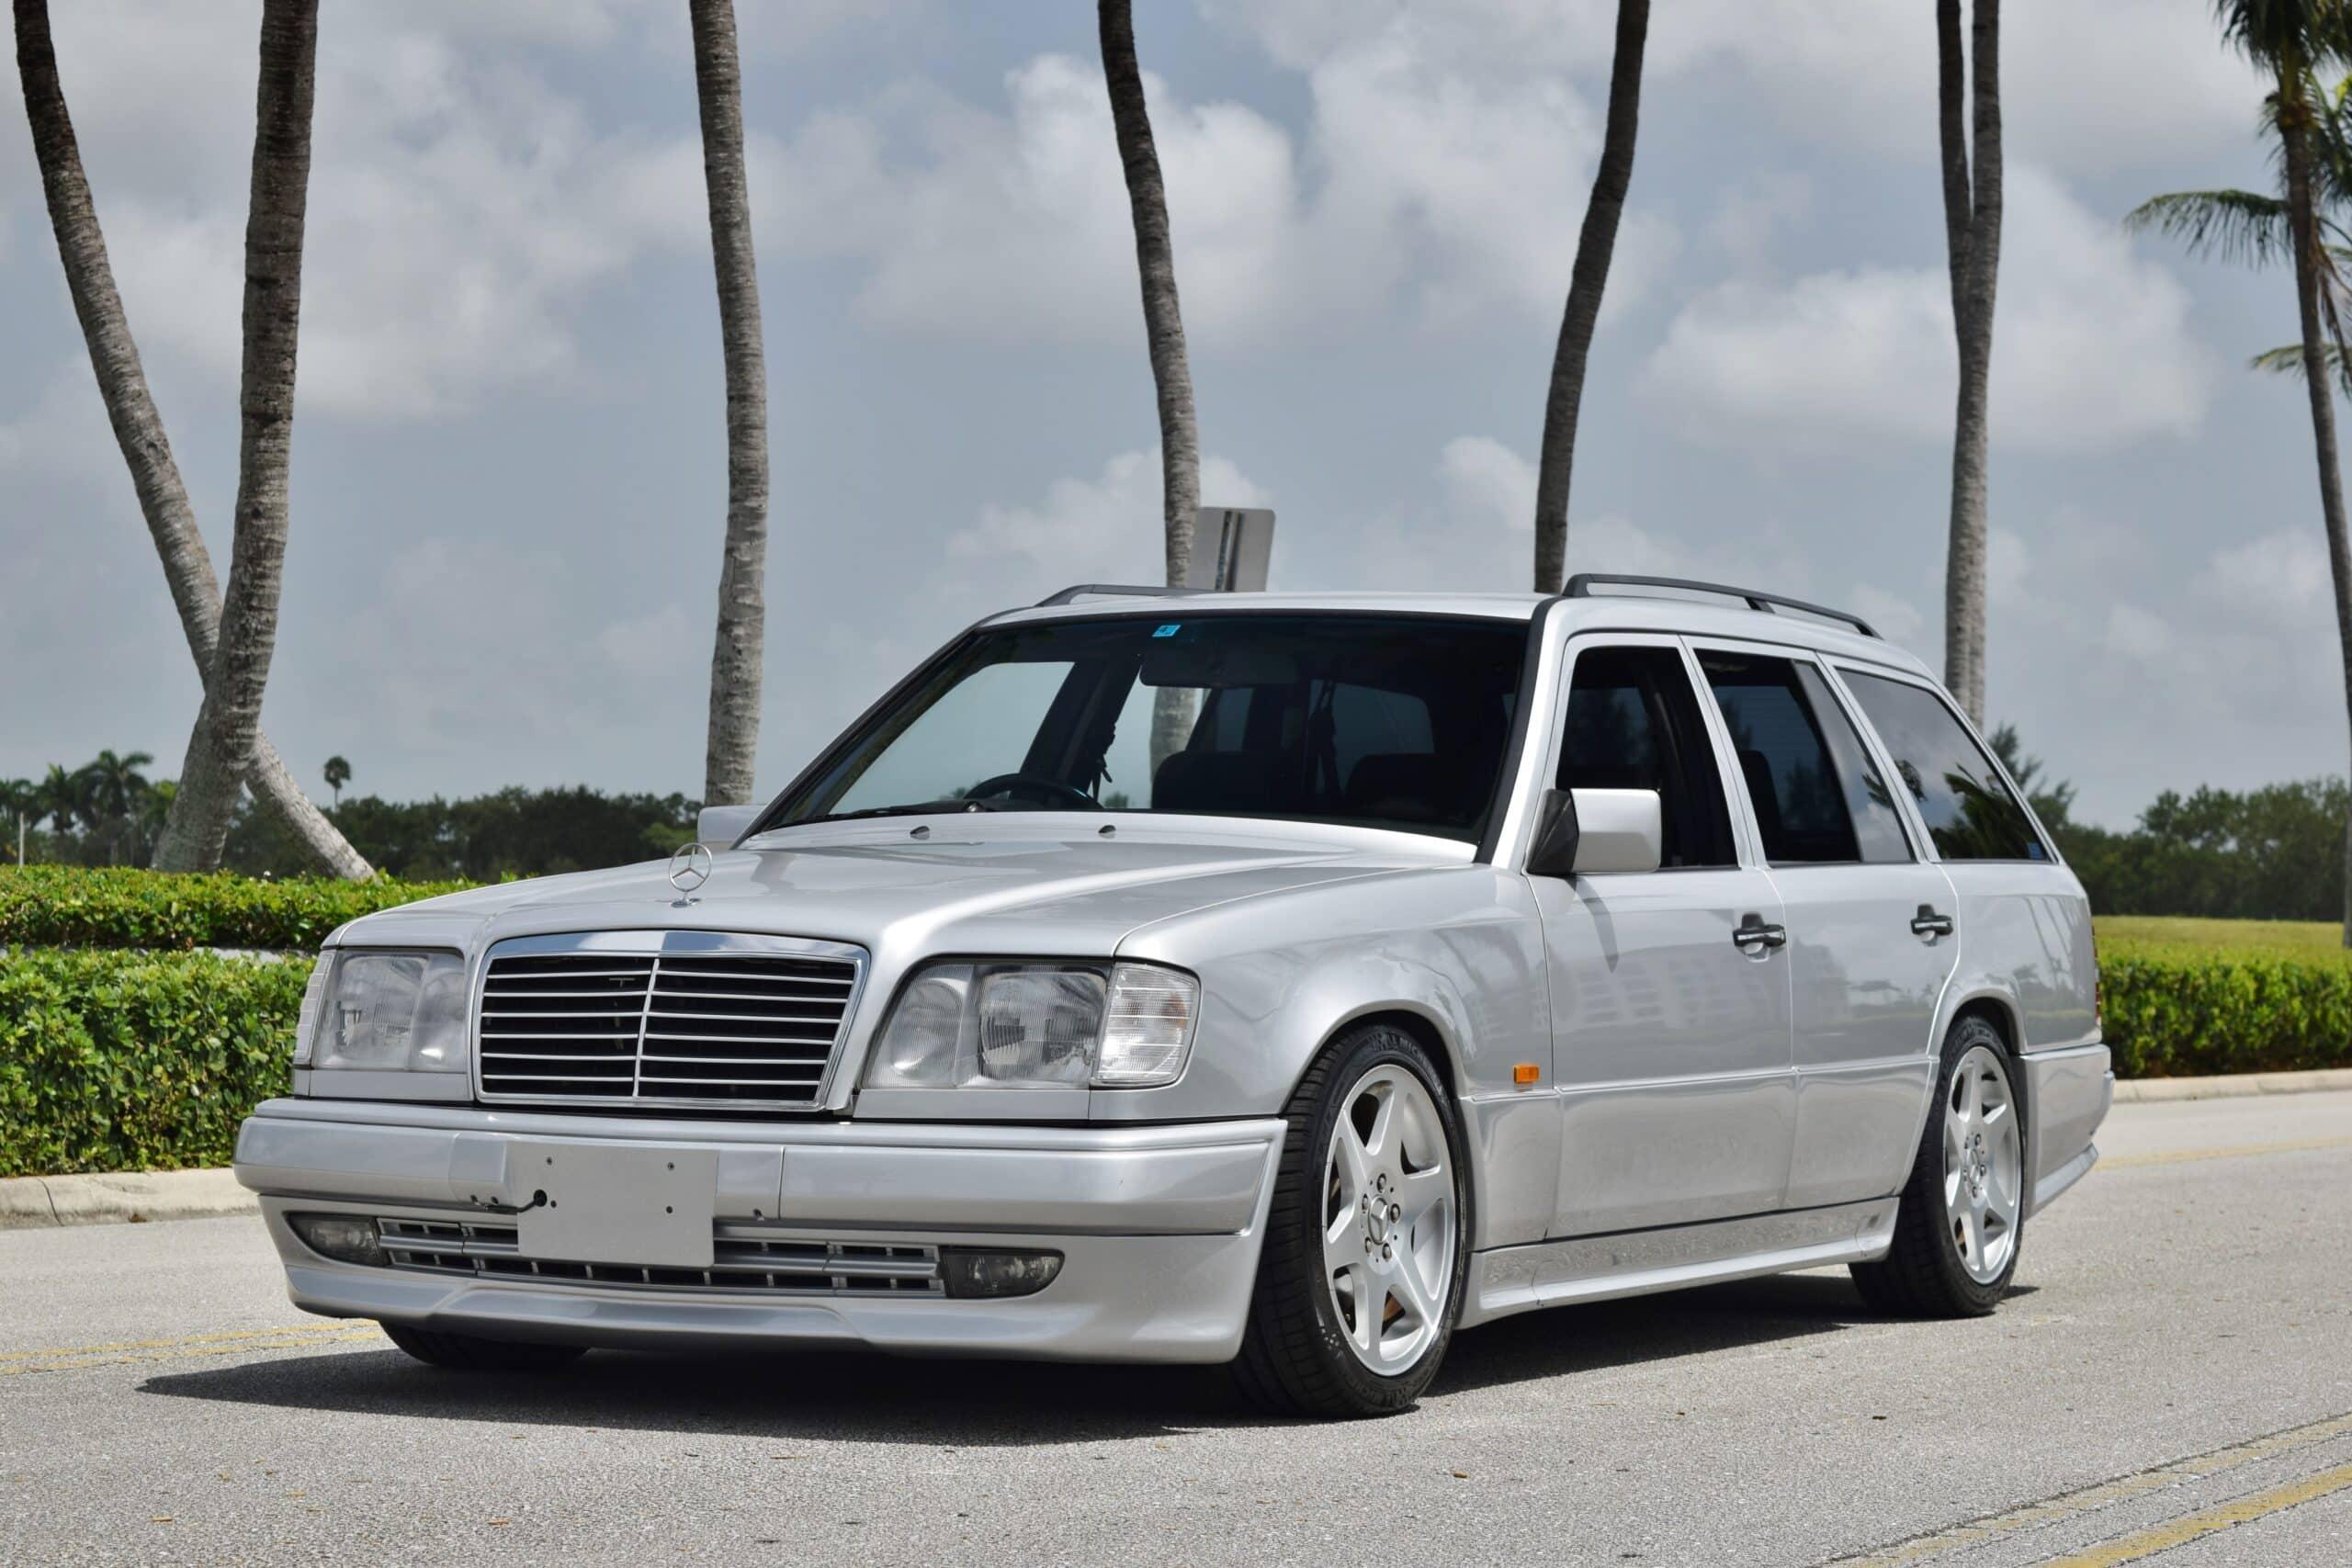 1994 Mercedes-Benz E-Class S124 Wagon RHD Euro – AMG Aero – EVO Wheels – Adjustable Koni's – ONLY 61K Miles – LIKE NEW